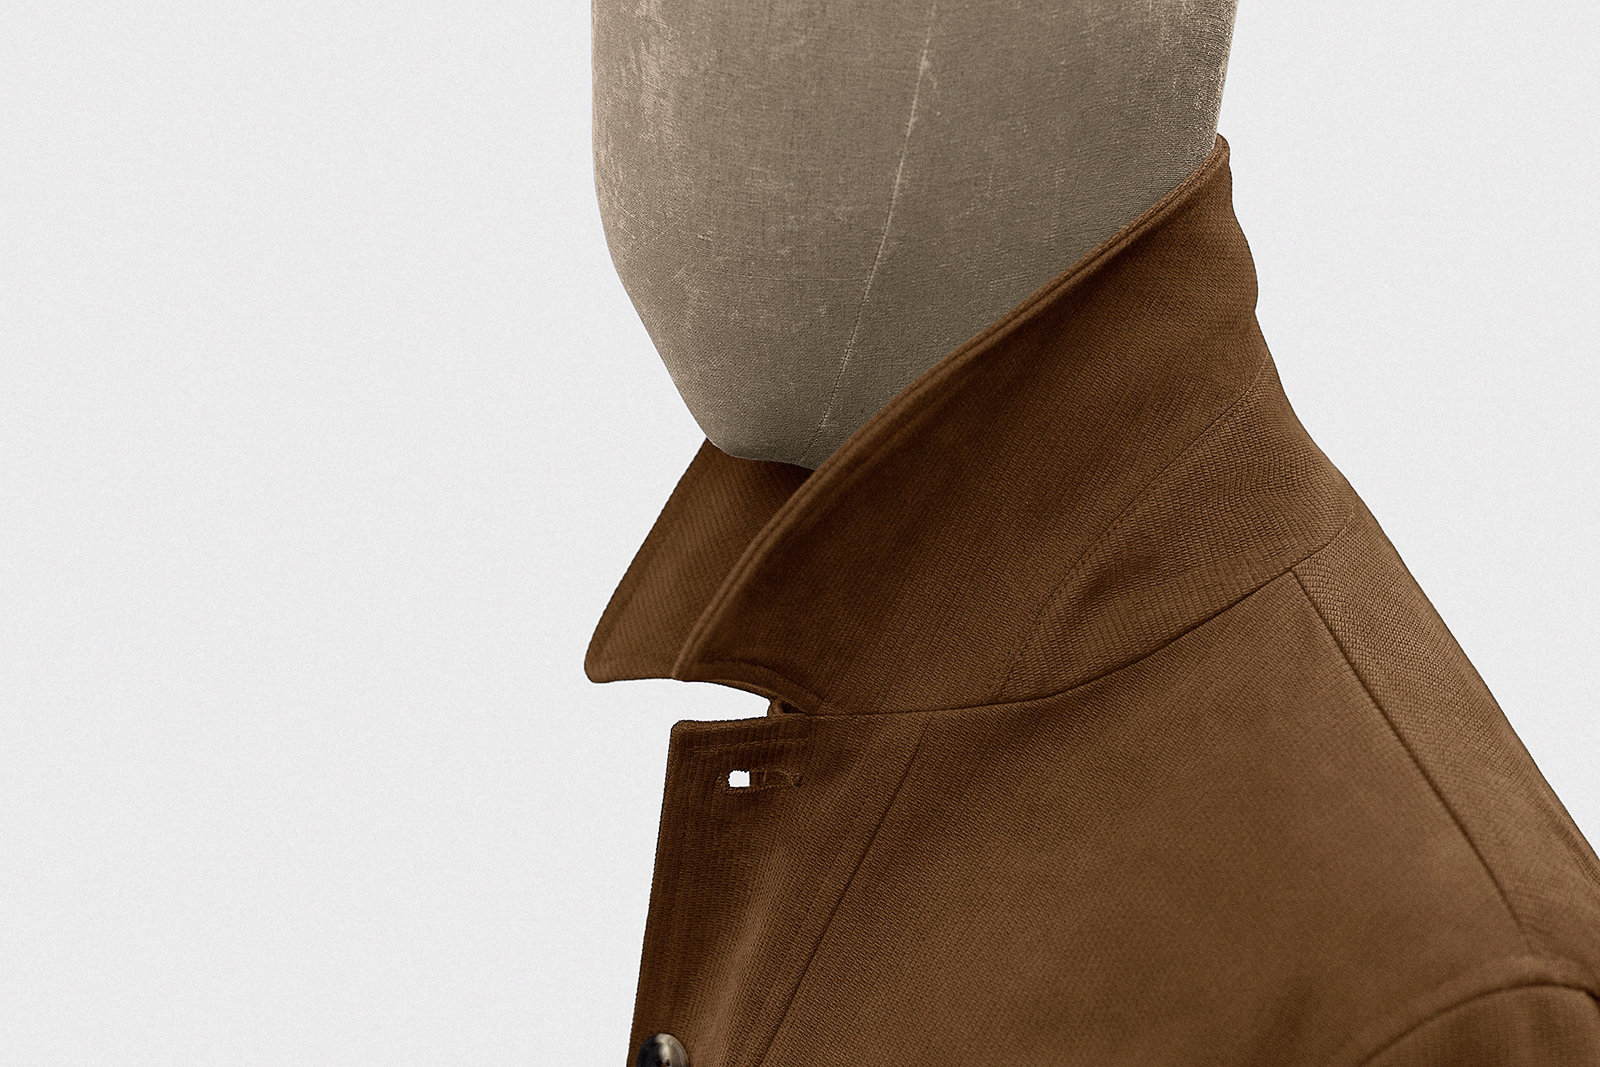 trucker-jacket-bedford-cord-rust-3@2x.jpg